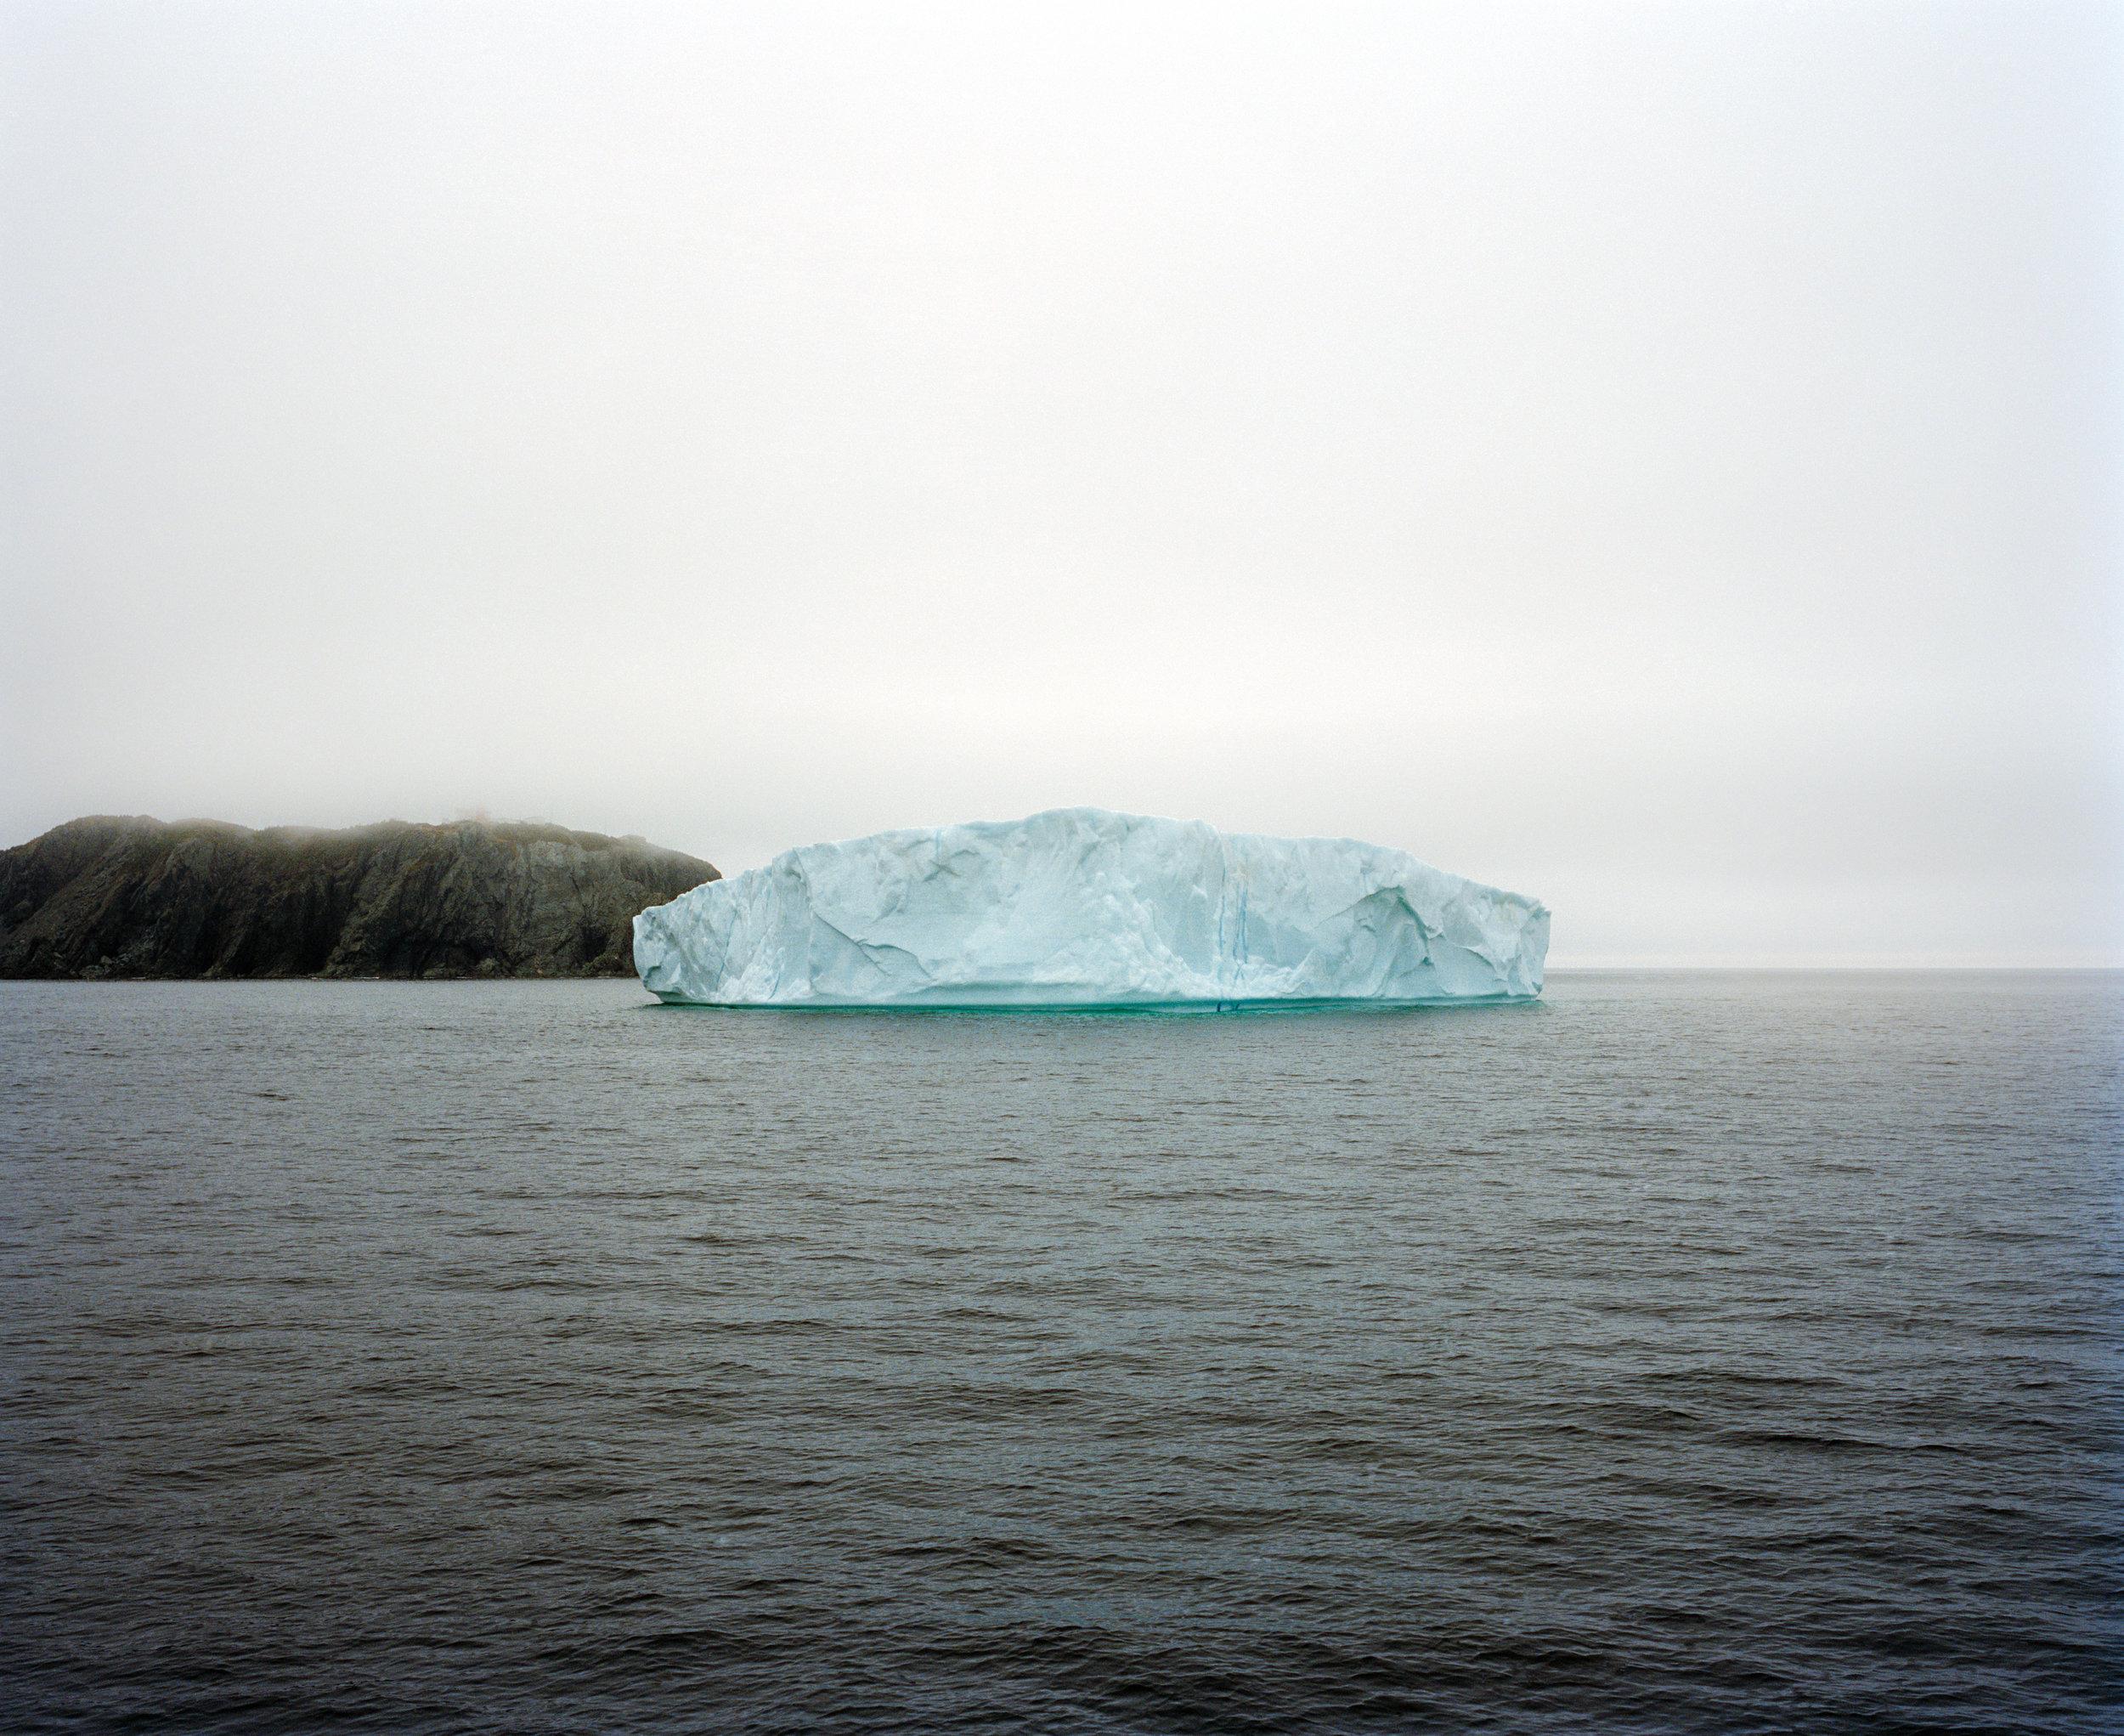 Double, Newfoundland 2008